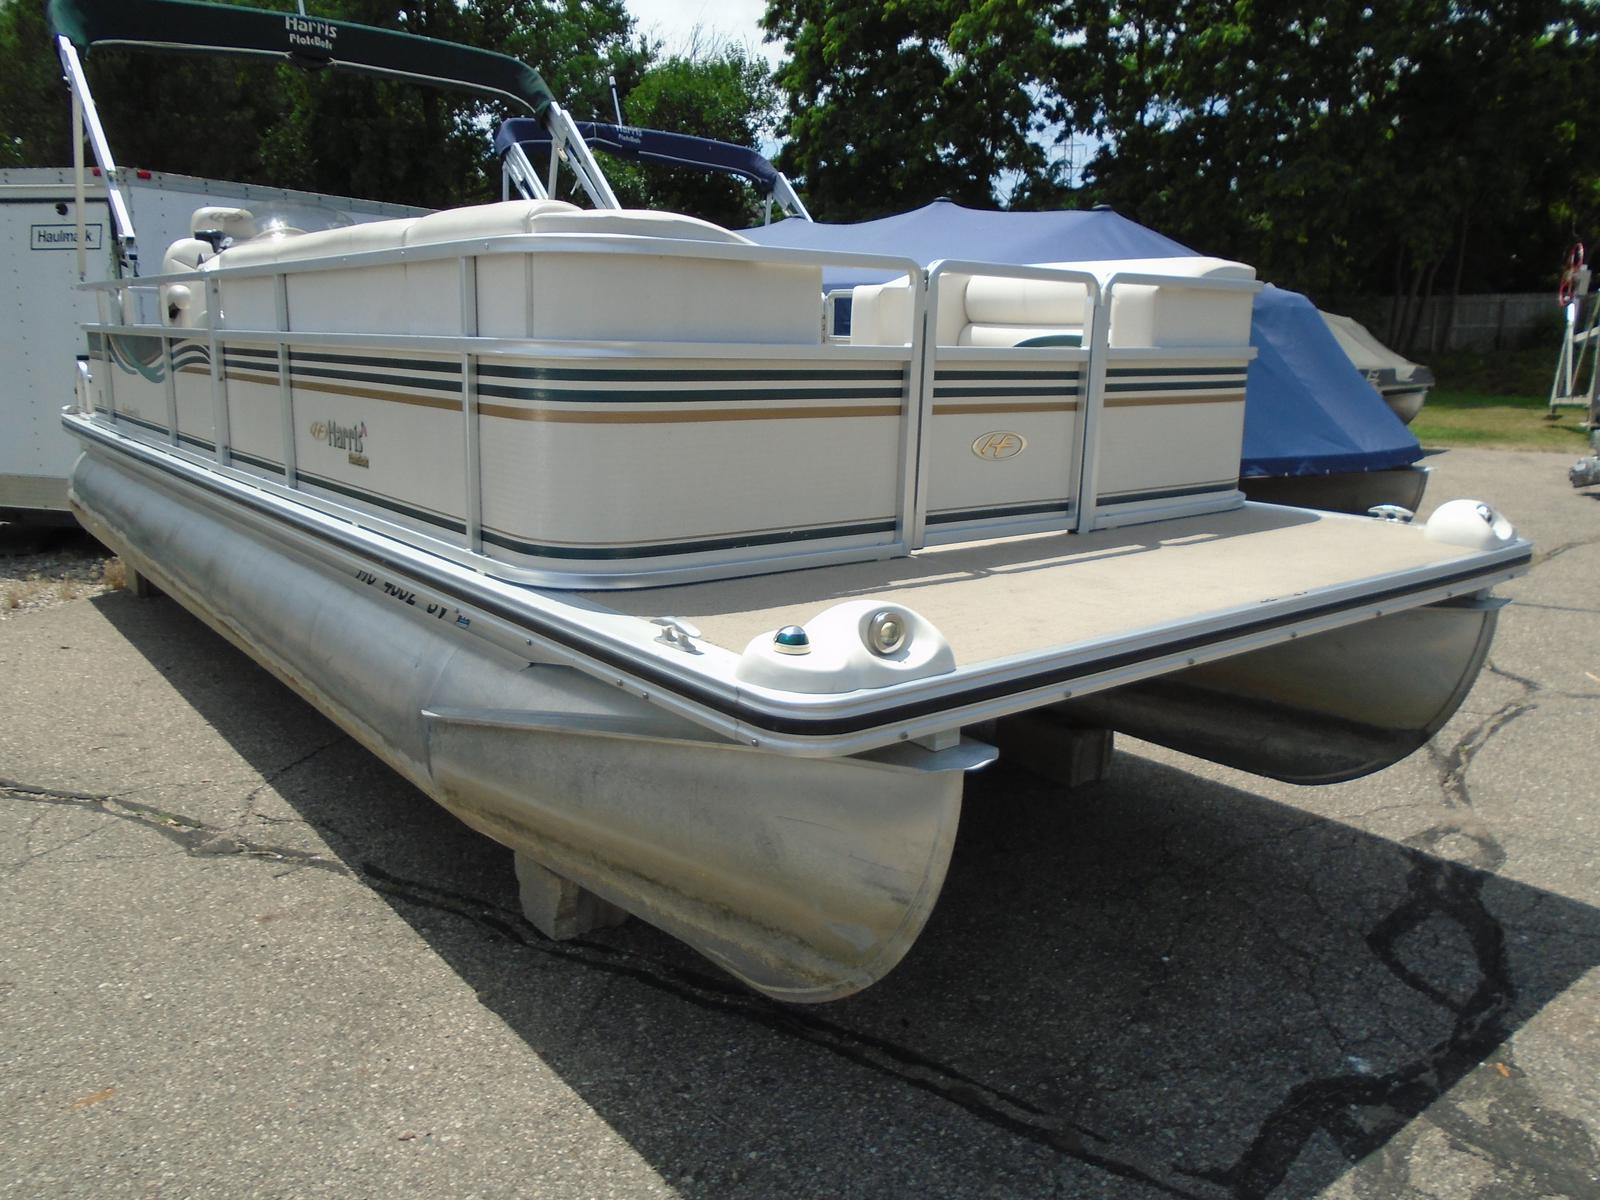 Used 2005 Harris Sunliner 220 Keego Harbor Mi 48320 Boat Trader